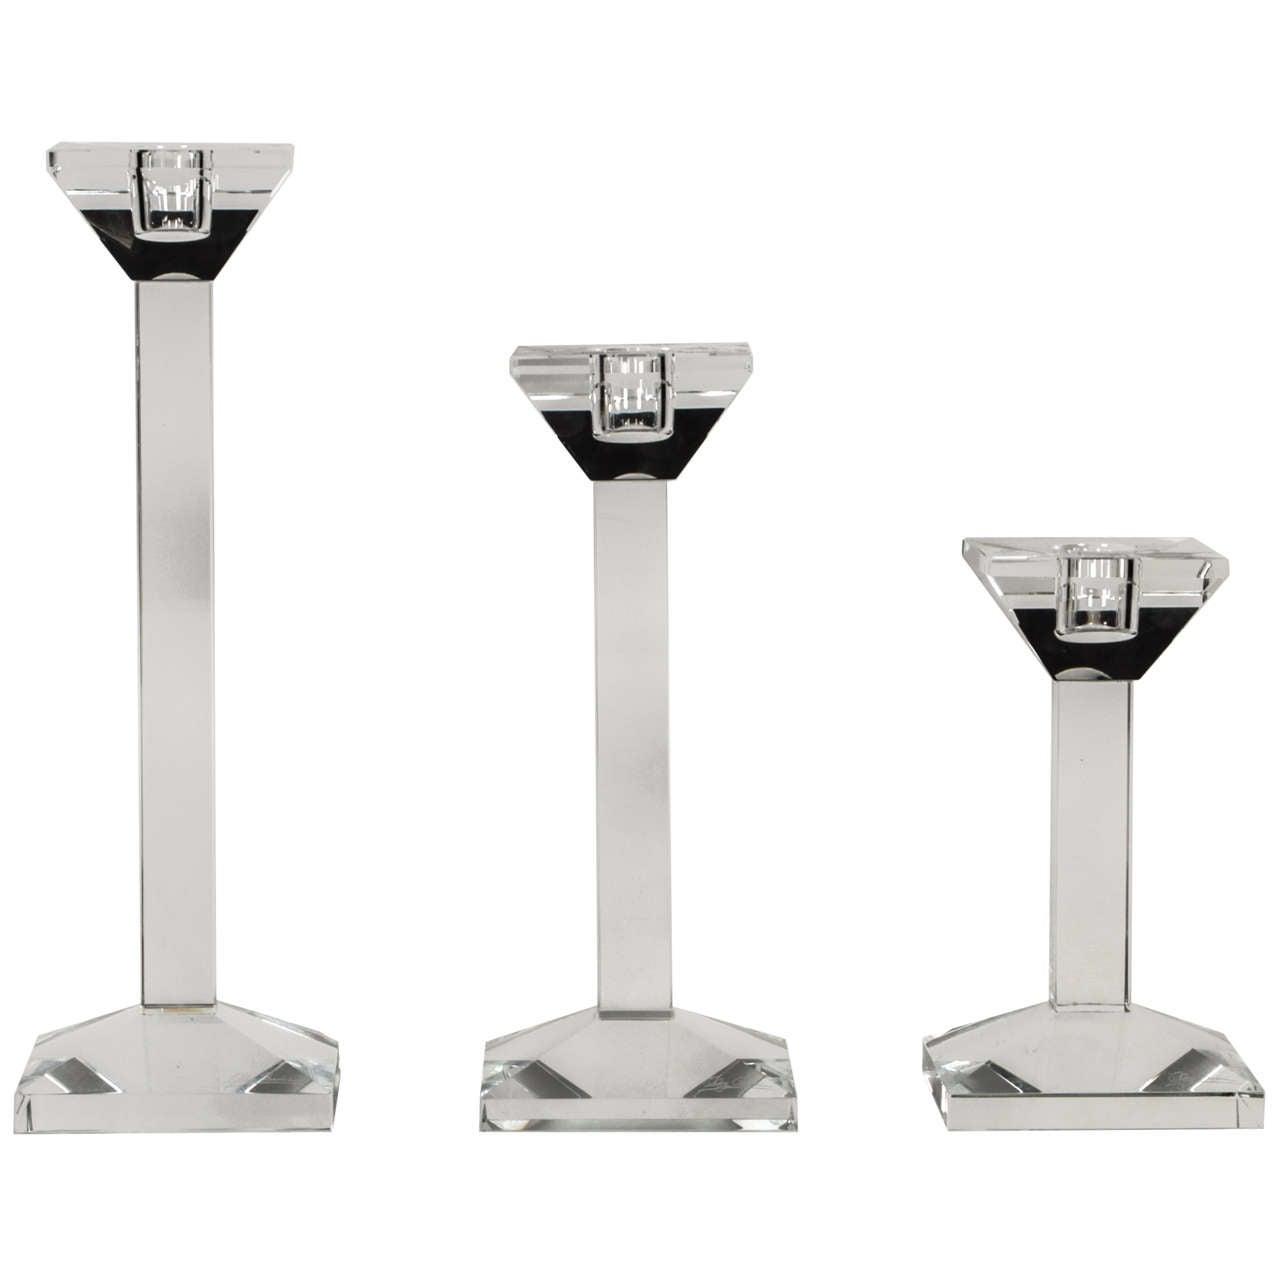 Set of 3 Crystal Candlesticks by Oleg Cassini